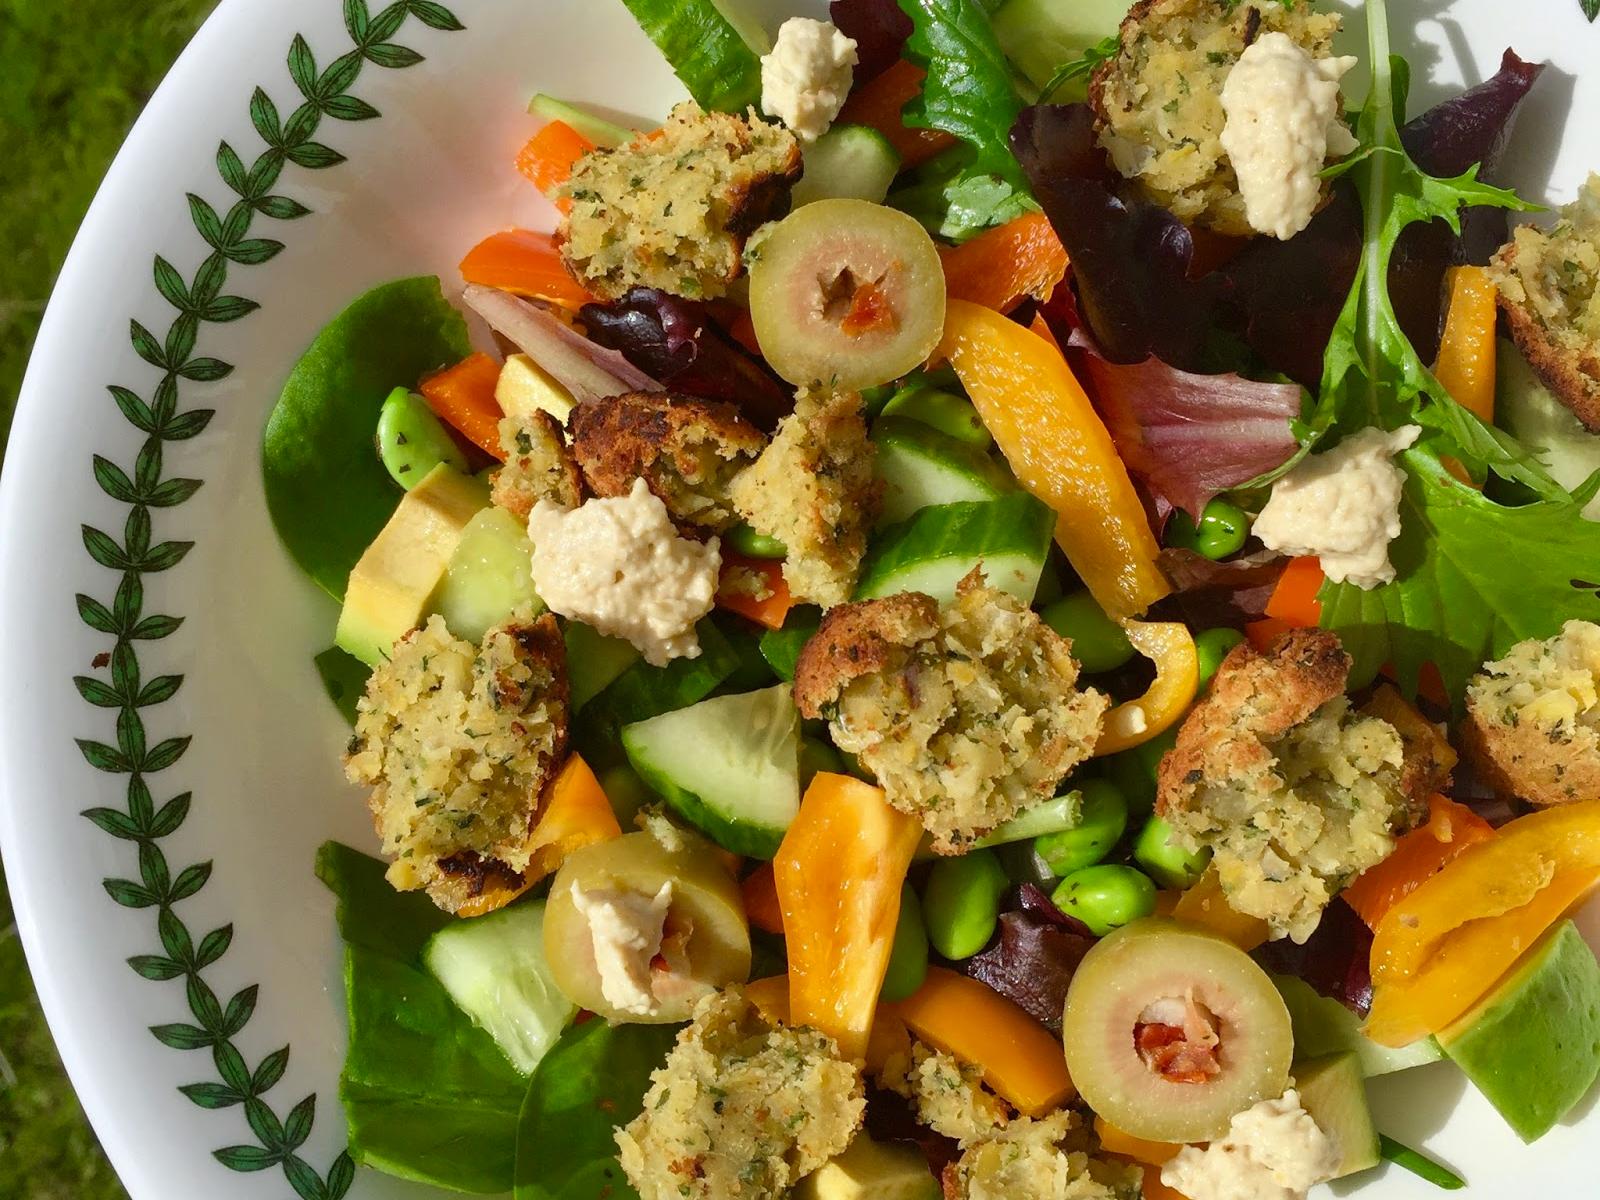 Vegan Wholesome Salad